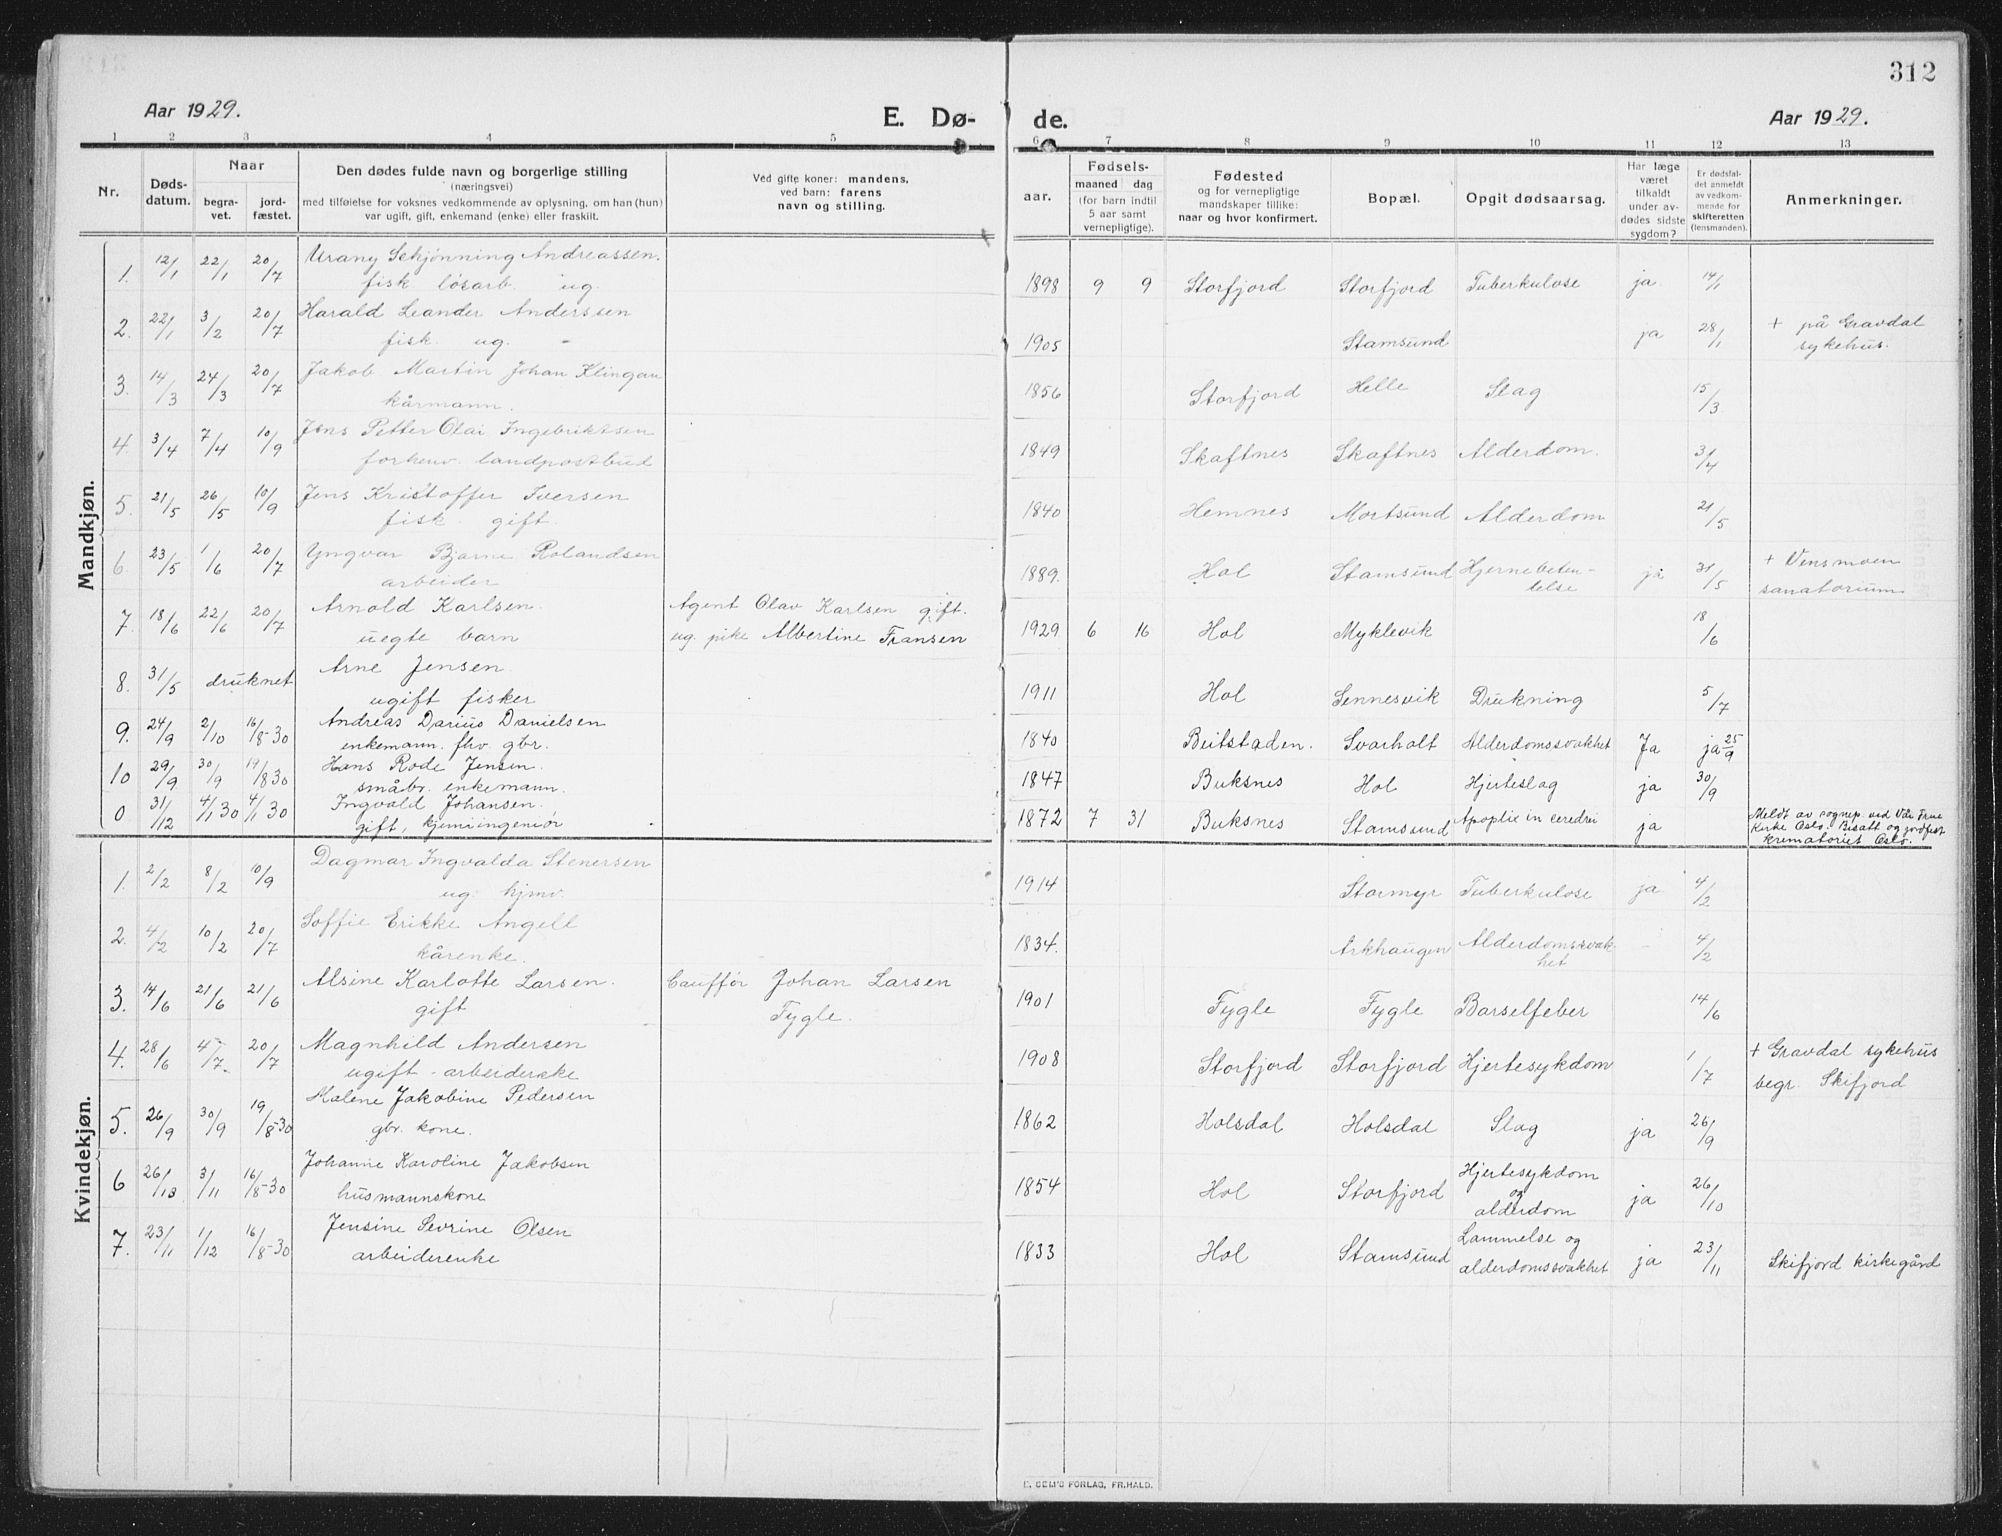 SAT, Ministerialprotokoller, klokkerbøker og fødselsregistre - Nordland, 882/L1183: Klokkerbok nr. 882C01, 1911-1938, s. 312